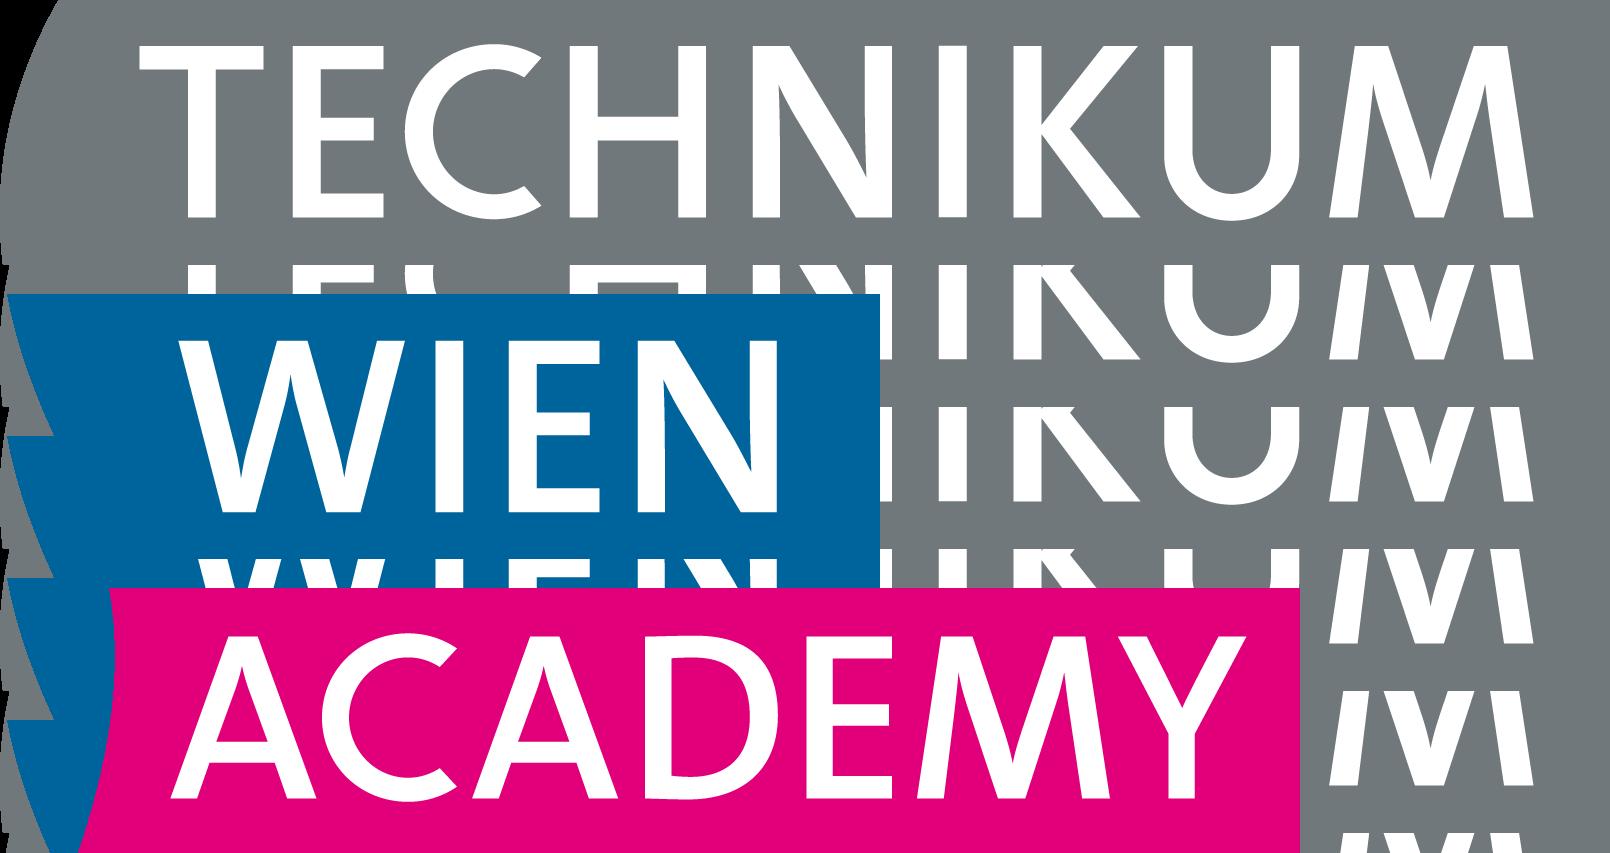 Technikum Academy